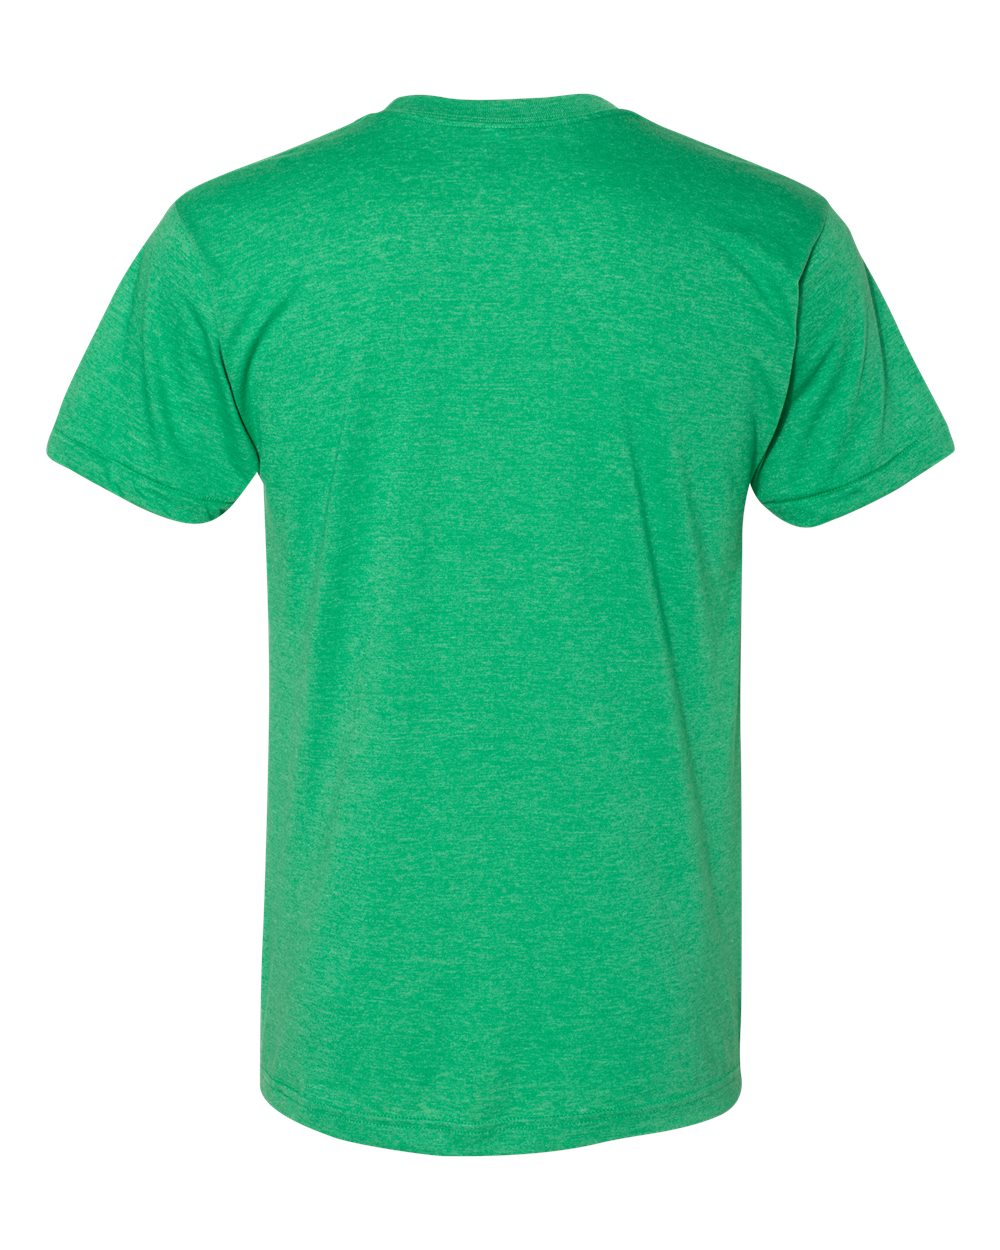 American-Apparel-Mens-Slim-Fit-50-50-Cotton-T-Shirt-Tee-BB401W-up-to-2XL thumbnail 25